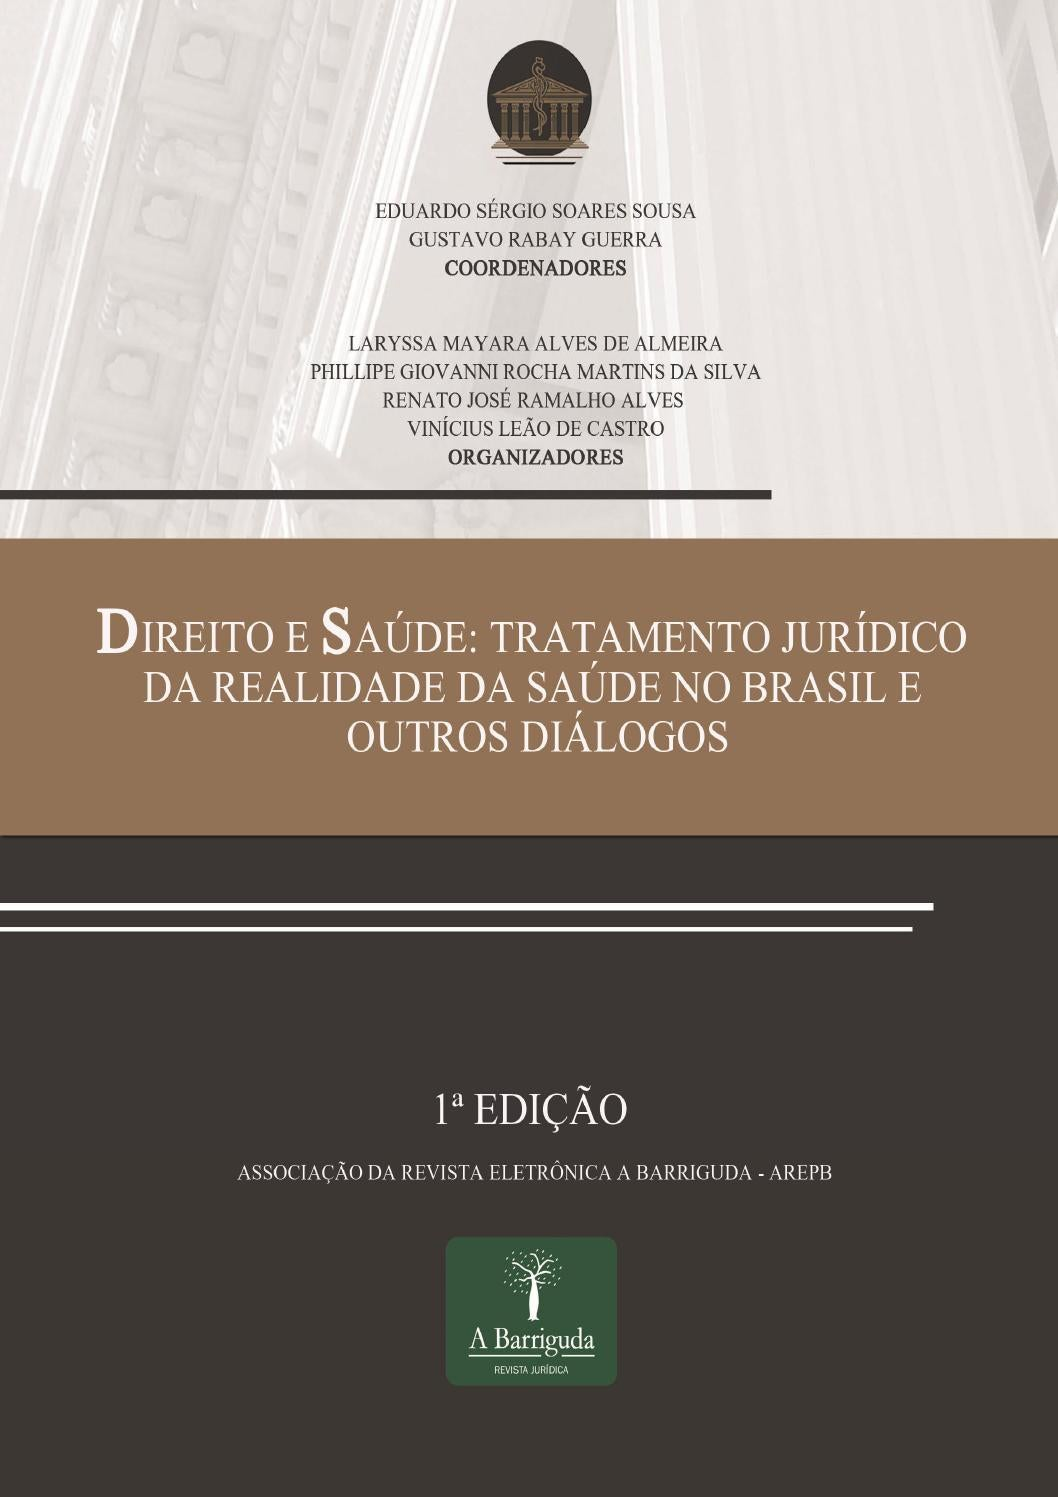 Direito e sade tratamento jurdico da realidade da sade no brasil direito e sade tratamento jurdico da realidade da sade no brasil e outros dilogos by abarriguda issuu fandeluxe Gallery